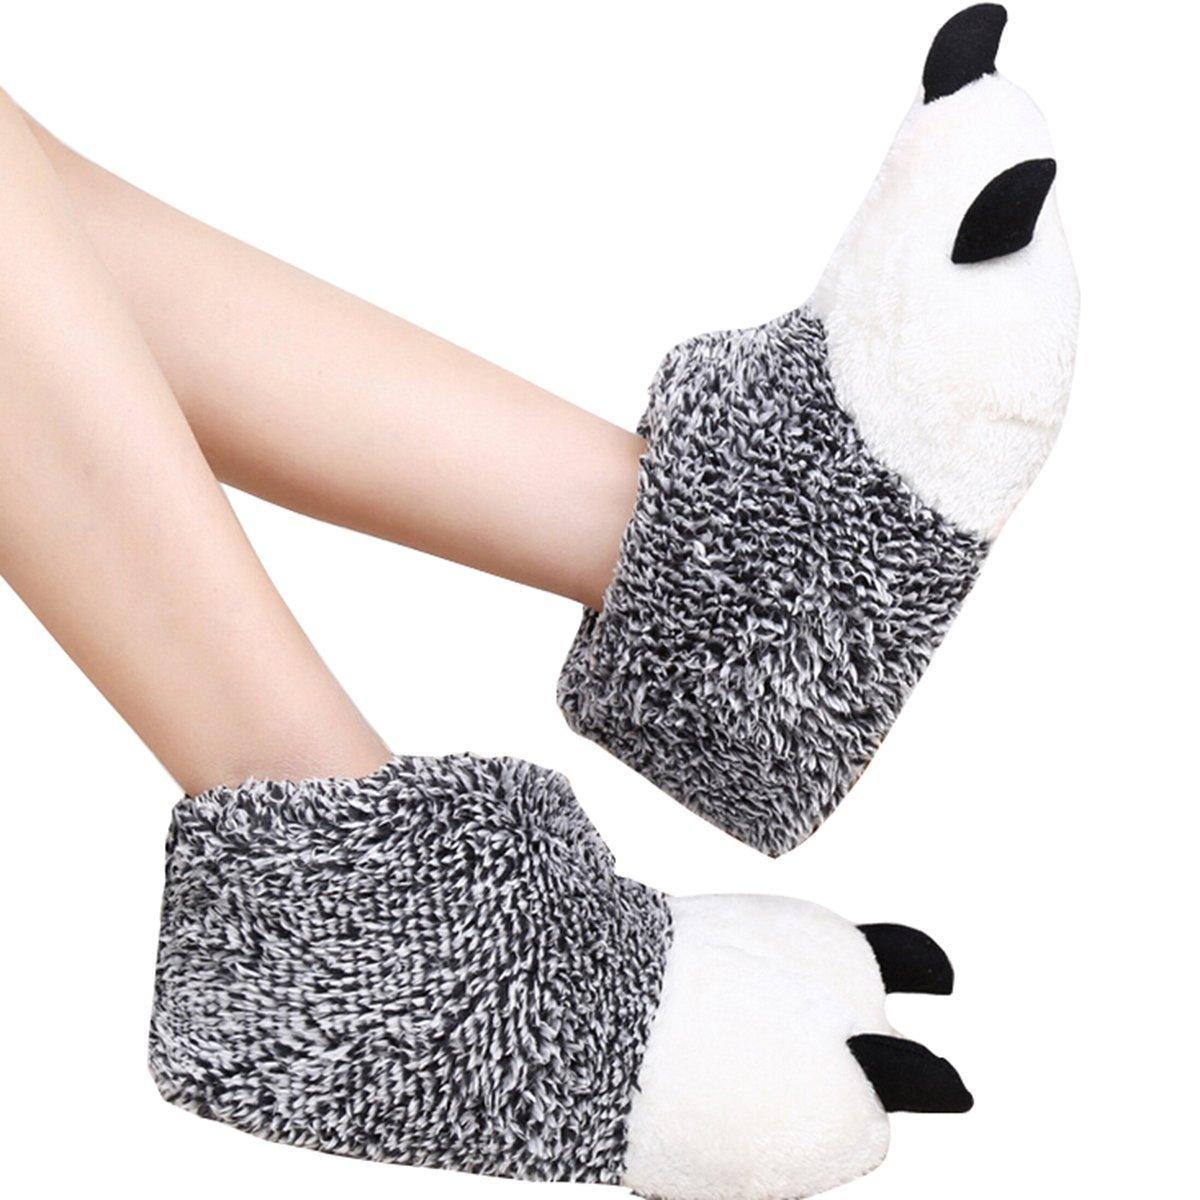 TININNA Unisex Invernali Calde Morbida zampa di peluche Pantofola Costume cosplay Animal Paw Pantofole Grigio